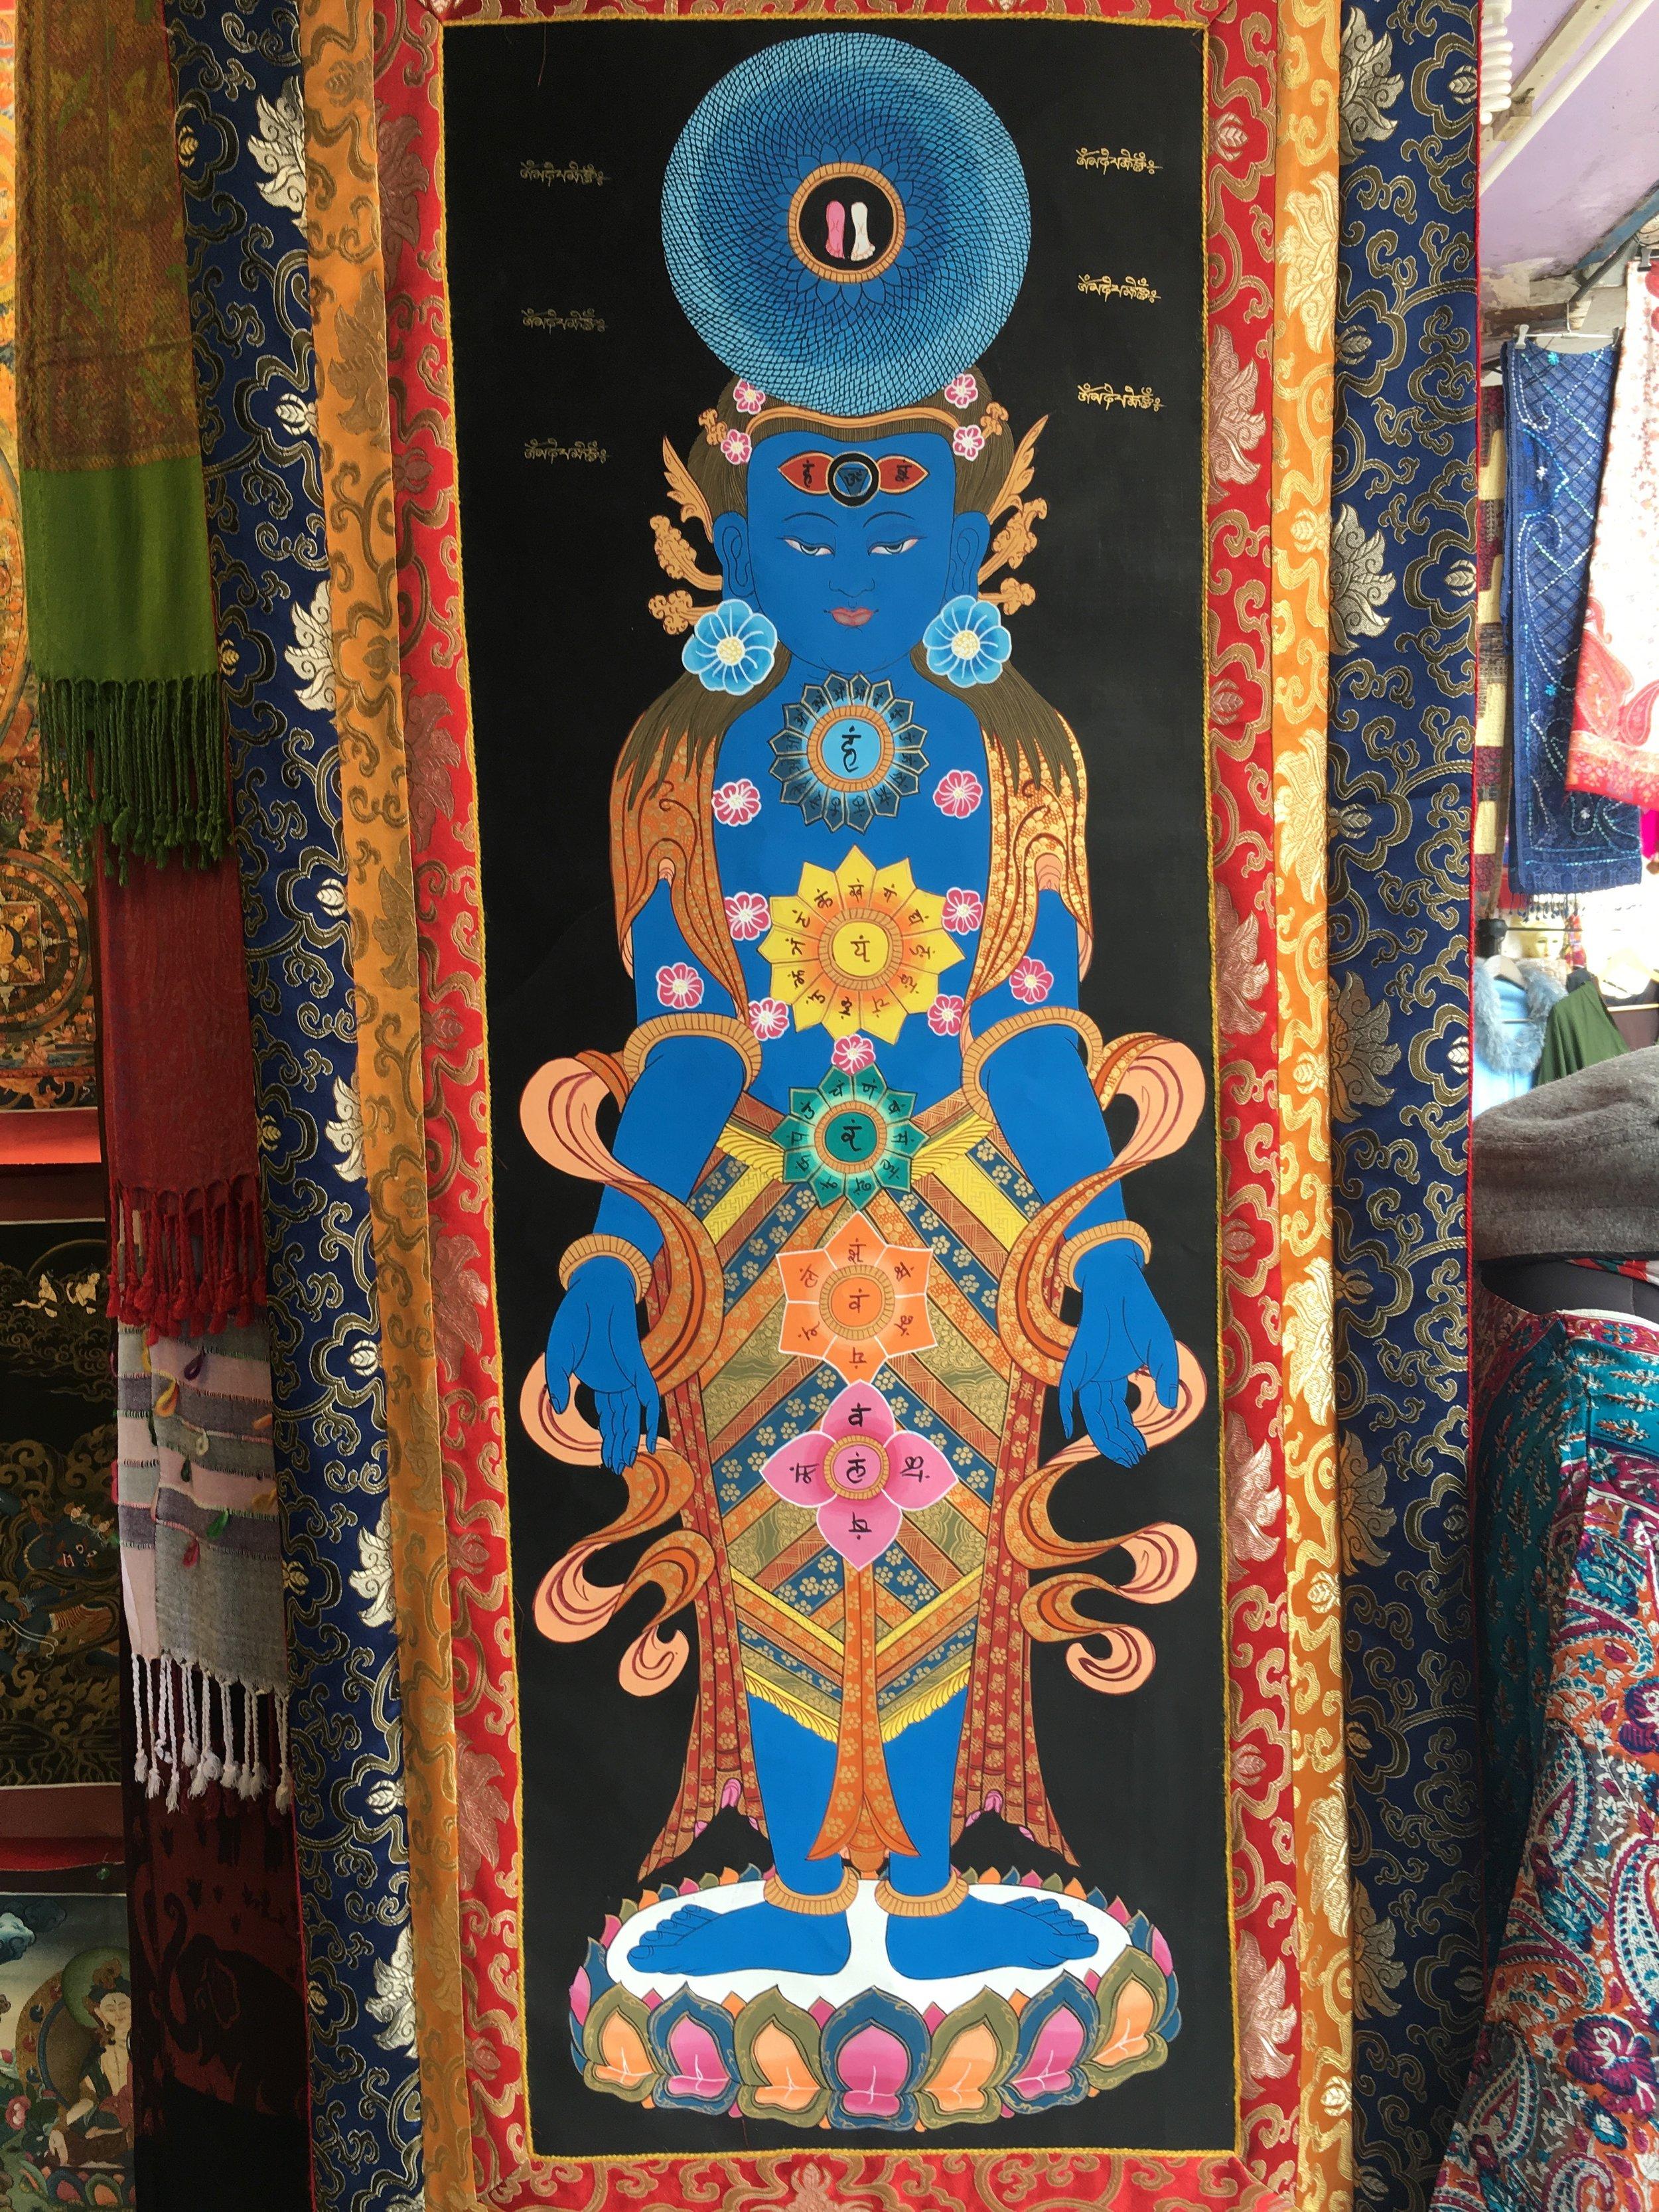 A Tibetan Thangka/tapestry representation of the 7 yogic chakras in McLeod Ganj, India